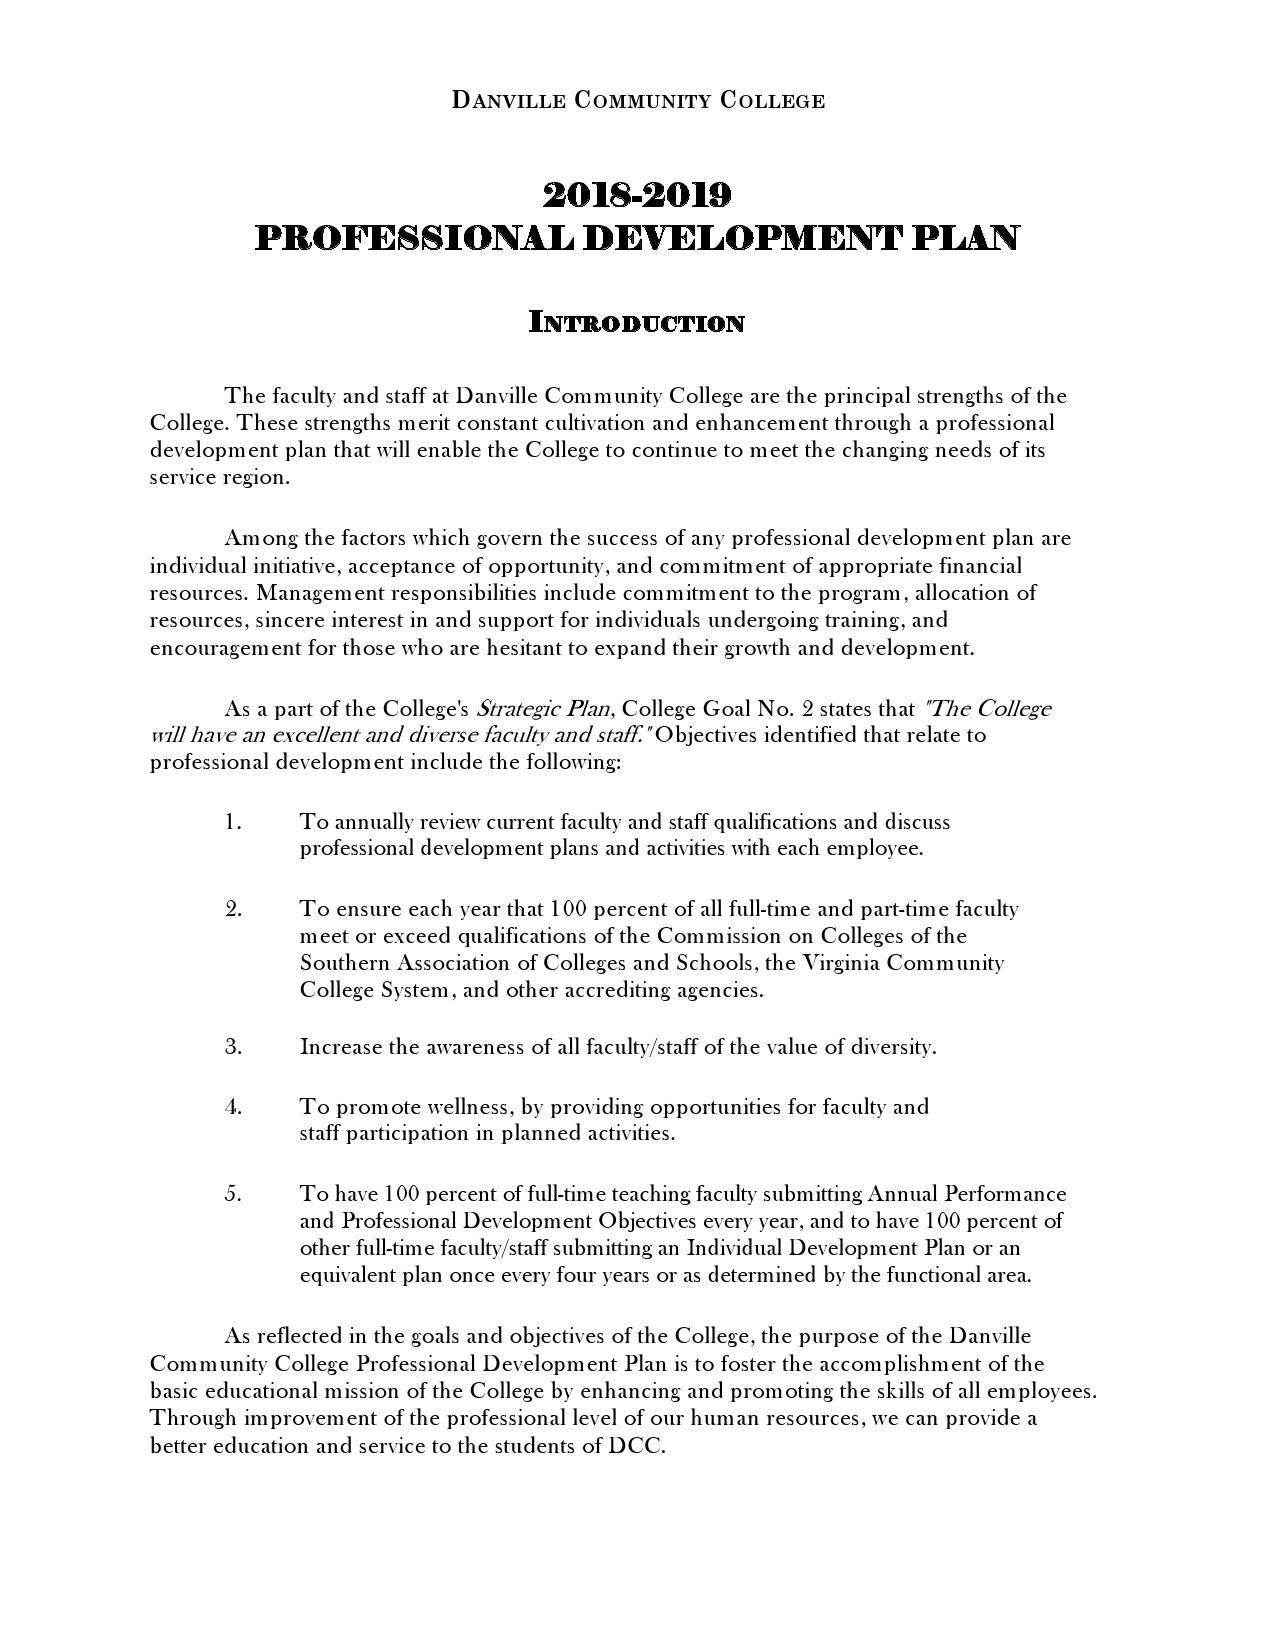 Free professional development plan 19